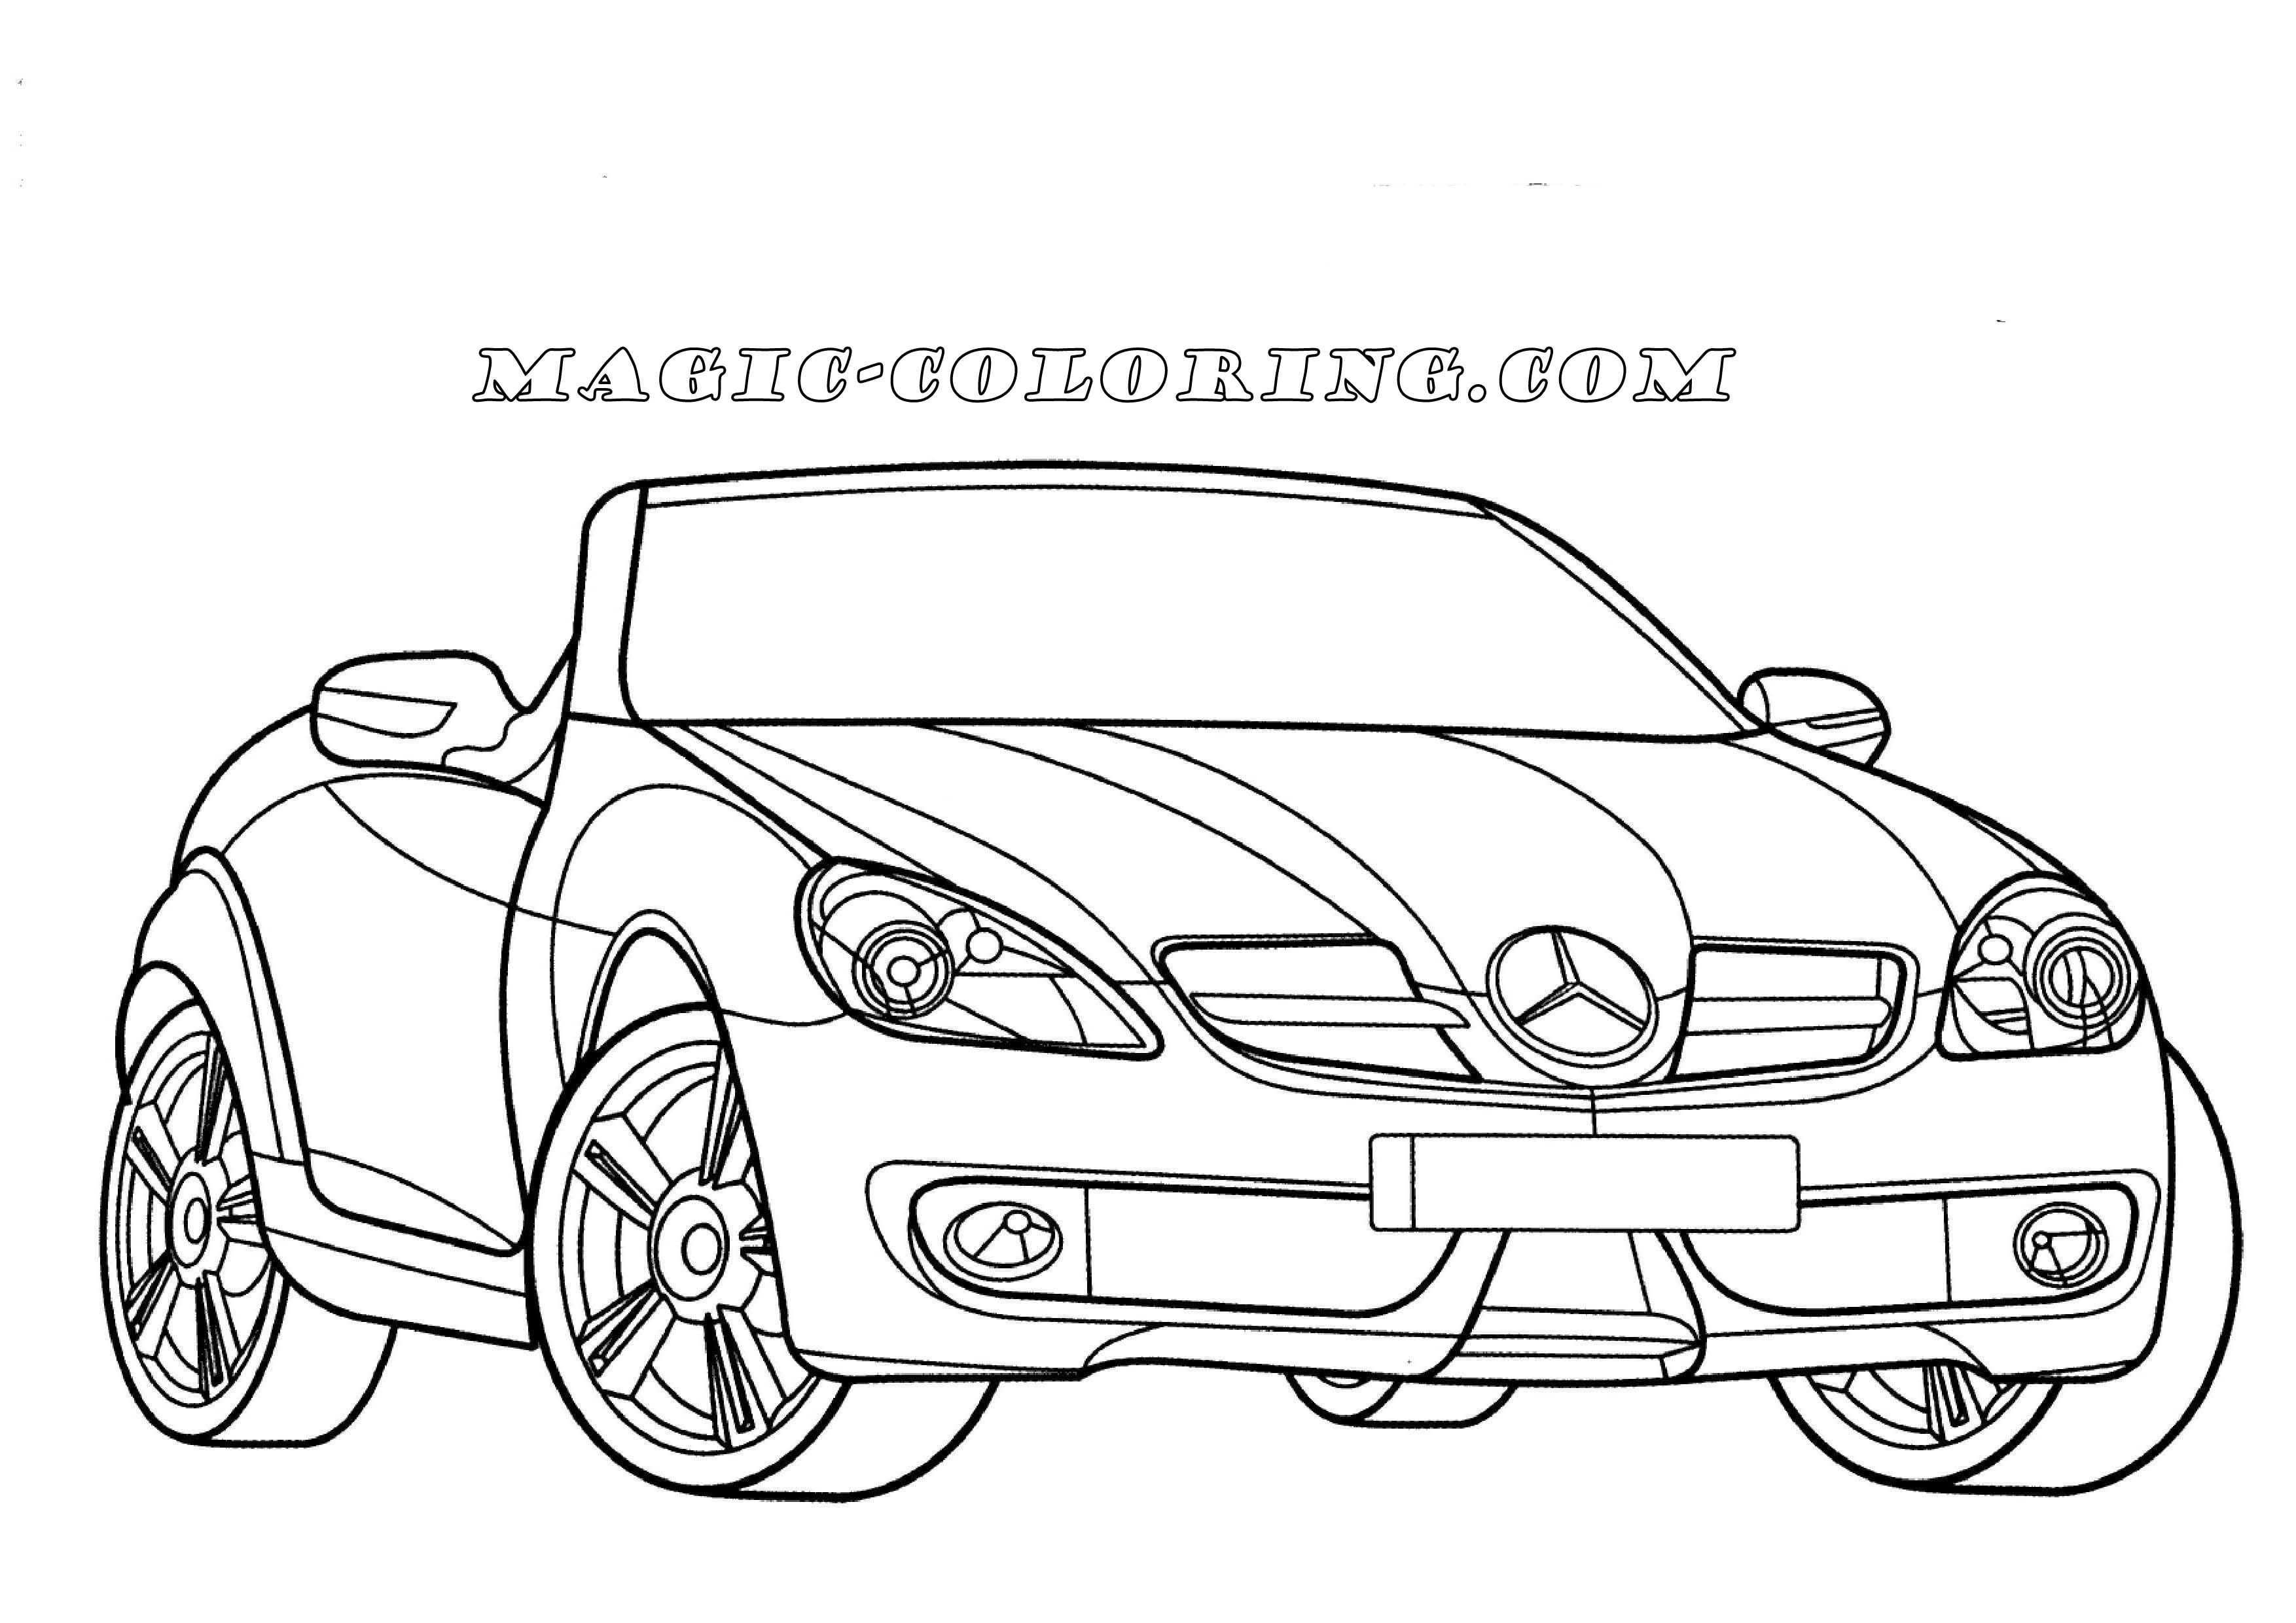 Mercedes Benz Slk Class Coloring Page Mercedes Benz Slk Mercedes Mercedes Benz